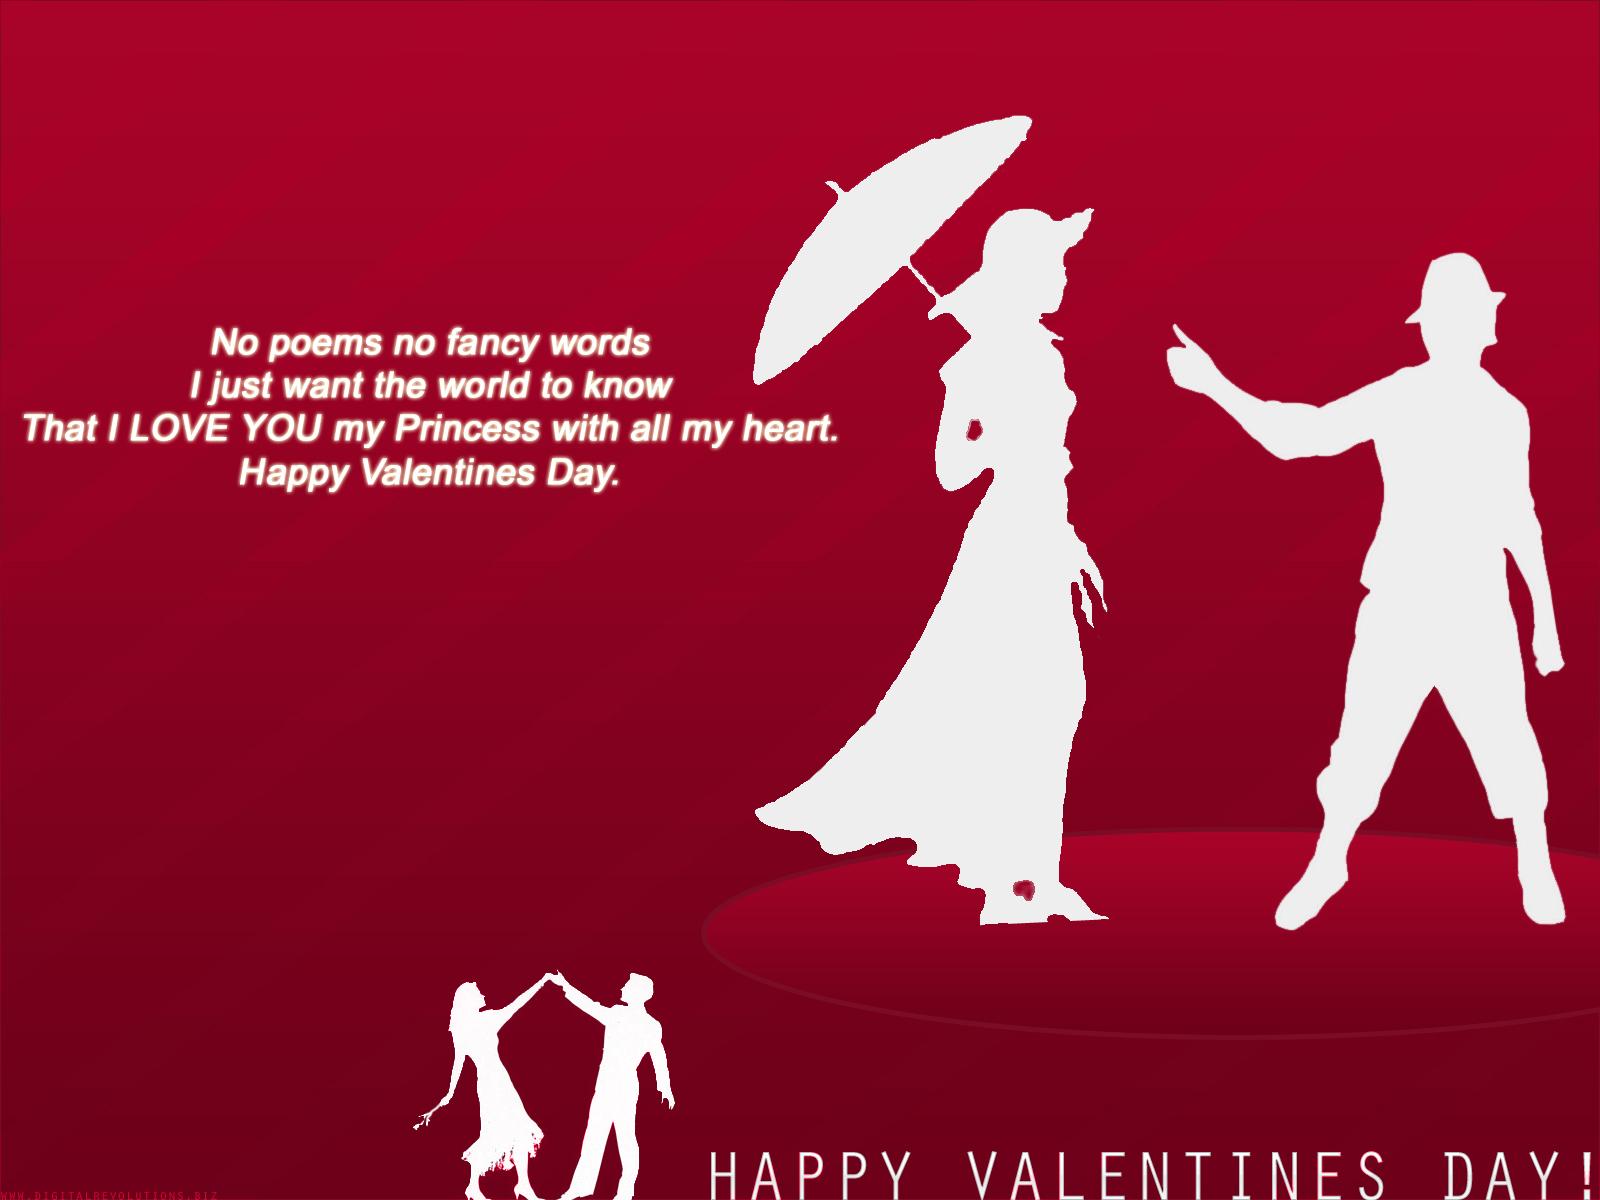 valentines day erotic ecards Free